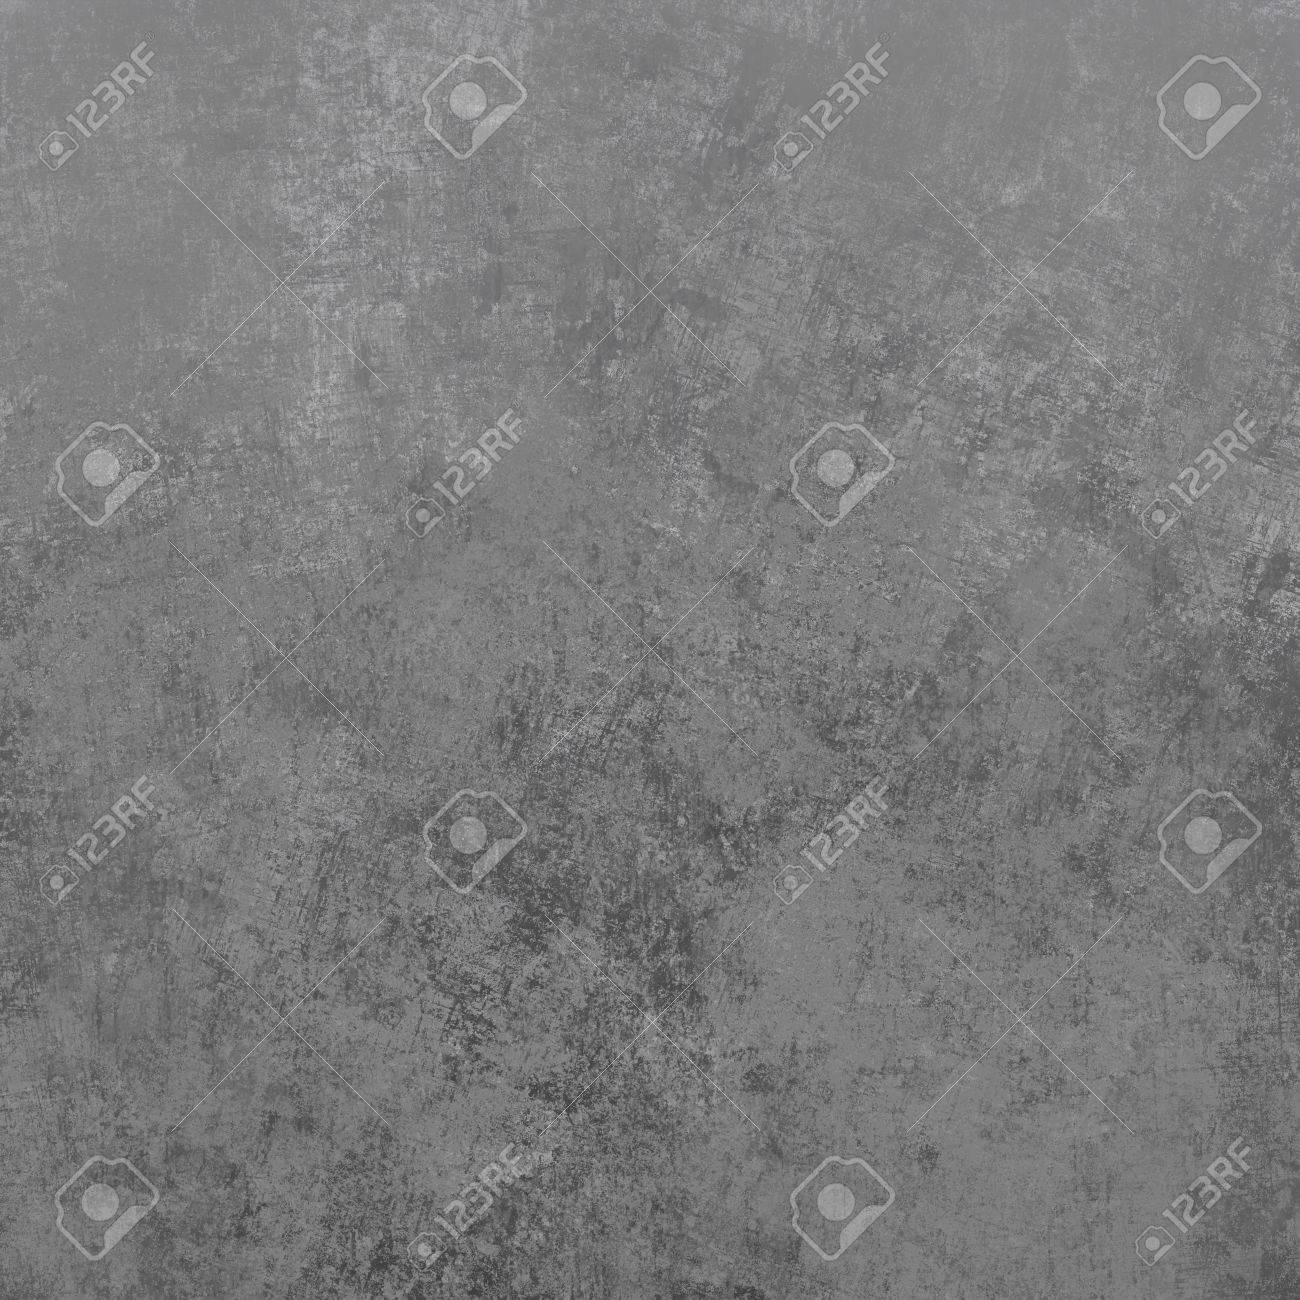 Grey designed grunge background. Vintage abstract texture - 75825127